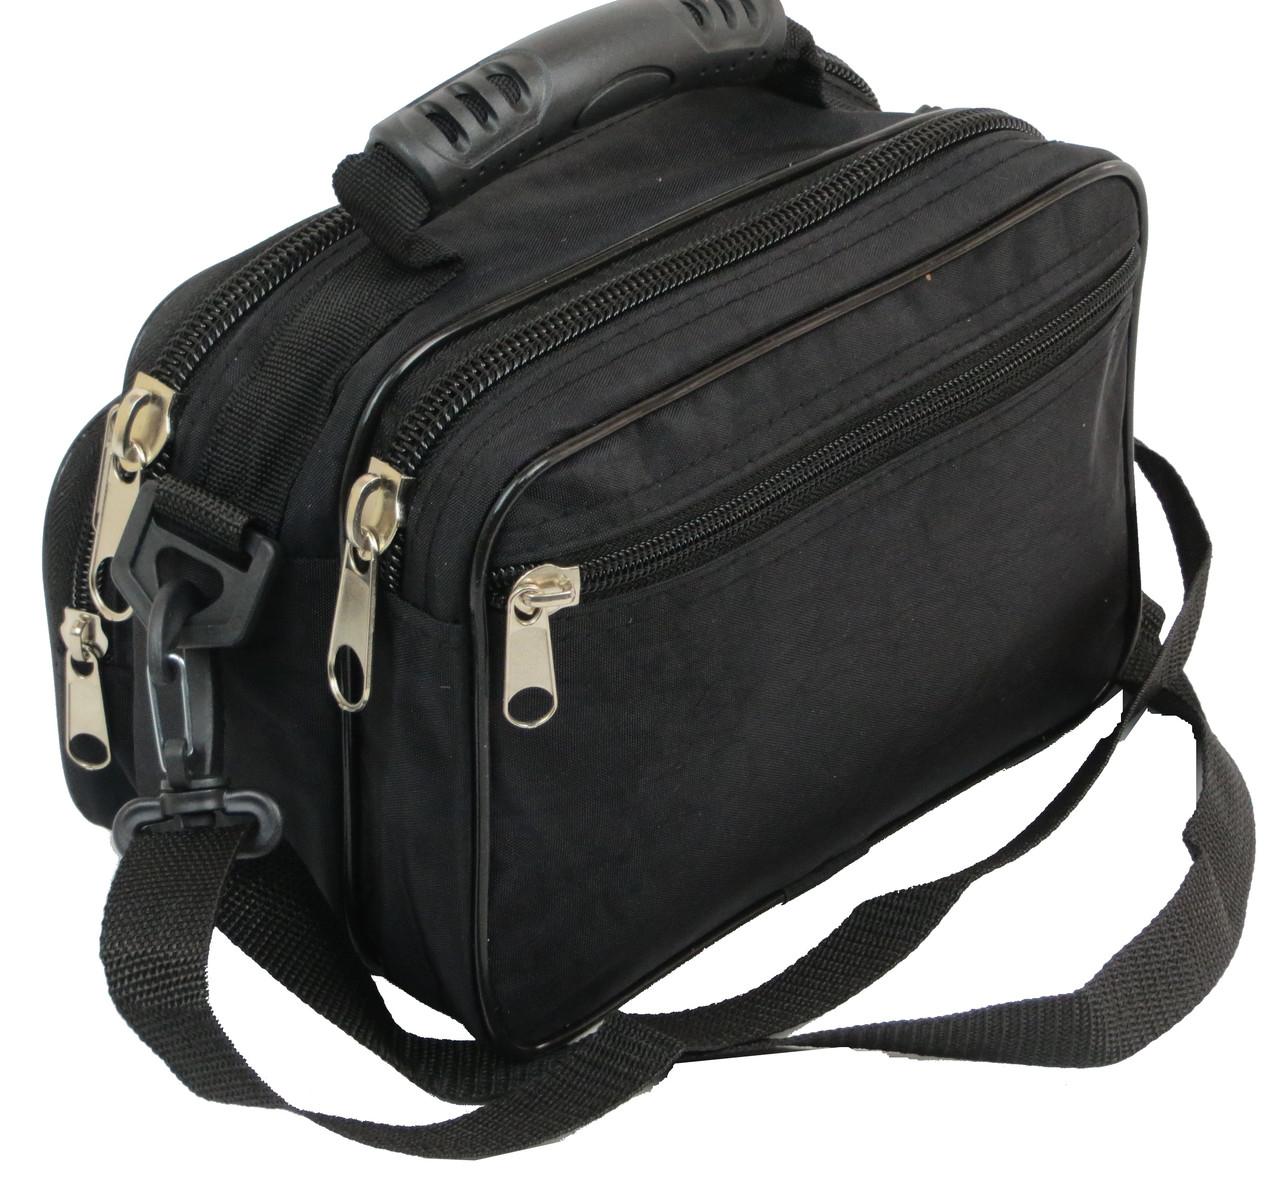 Чоловіча компактна сумка, барсетка Wallaby 21231